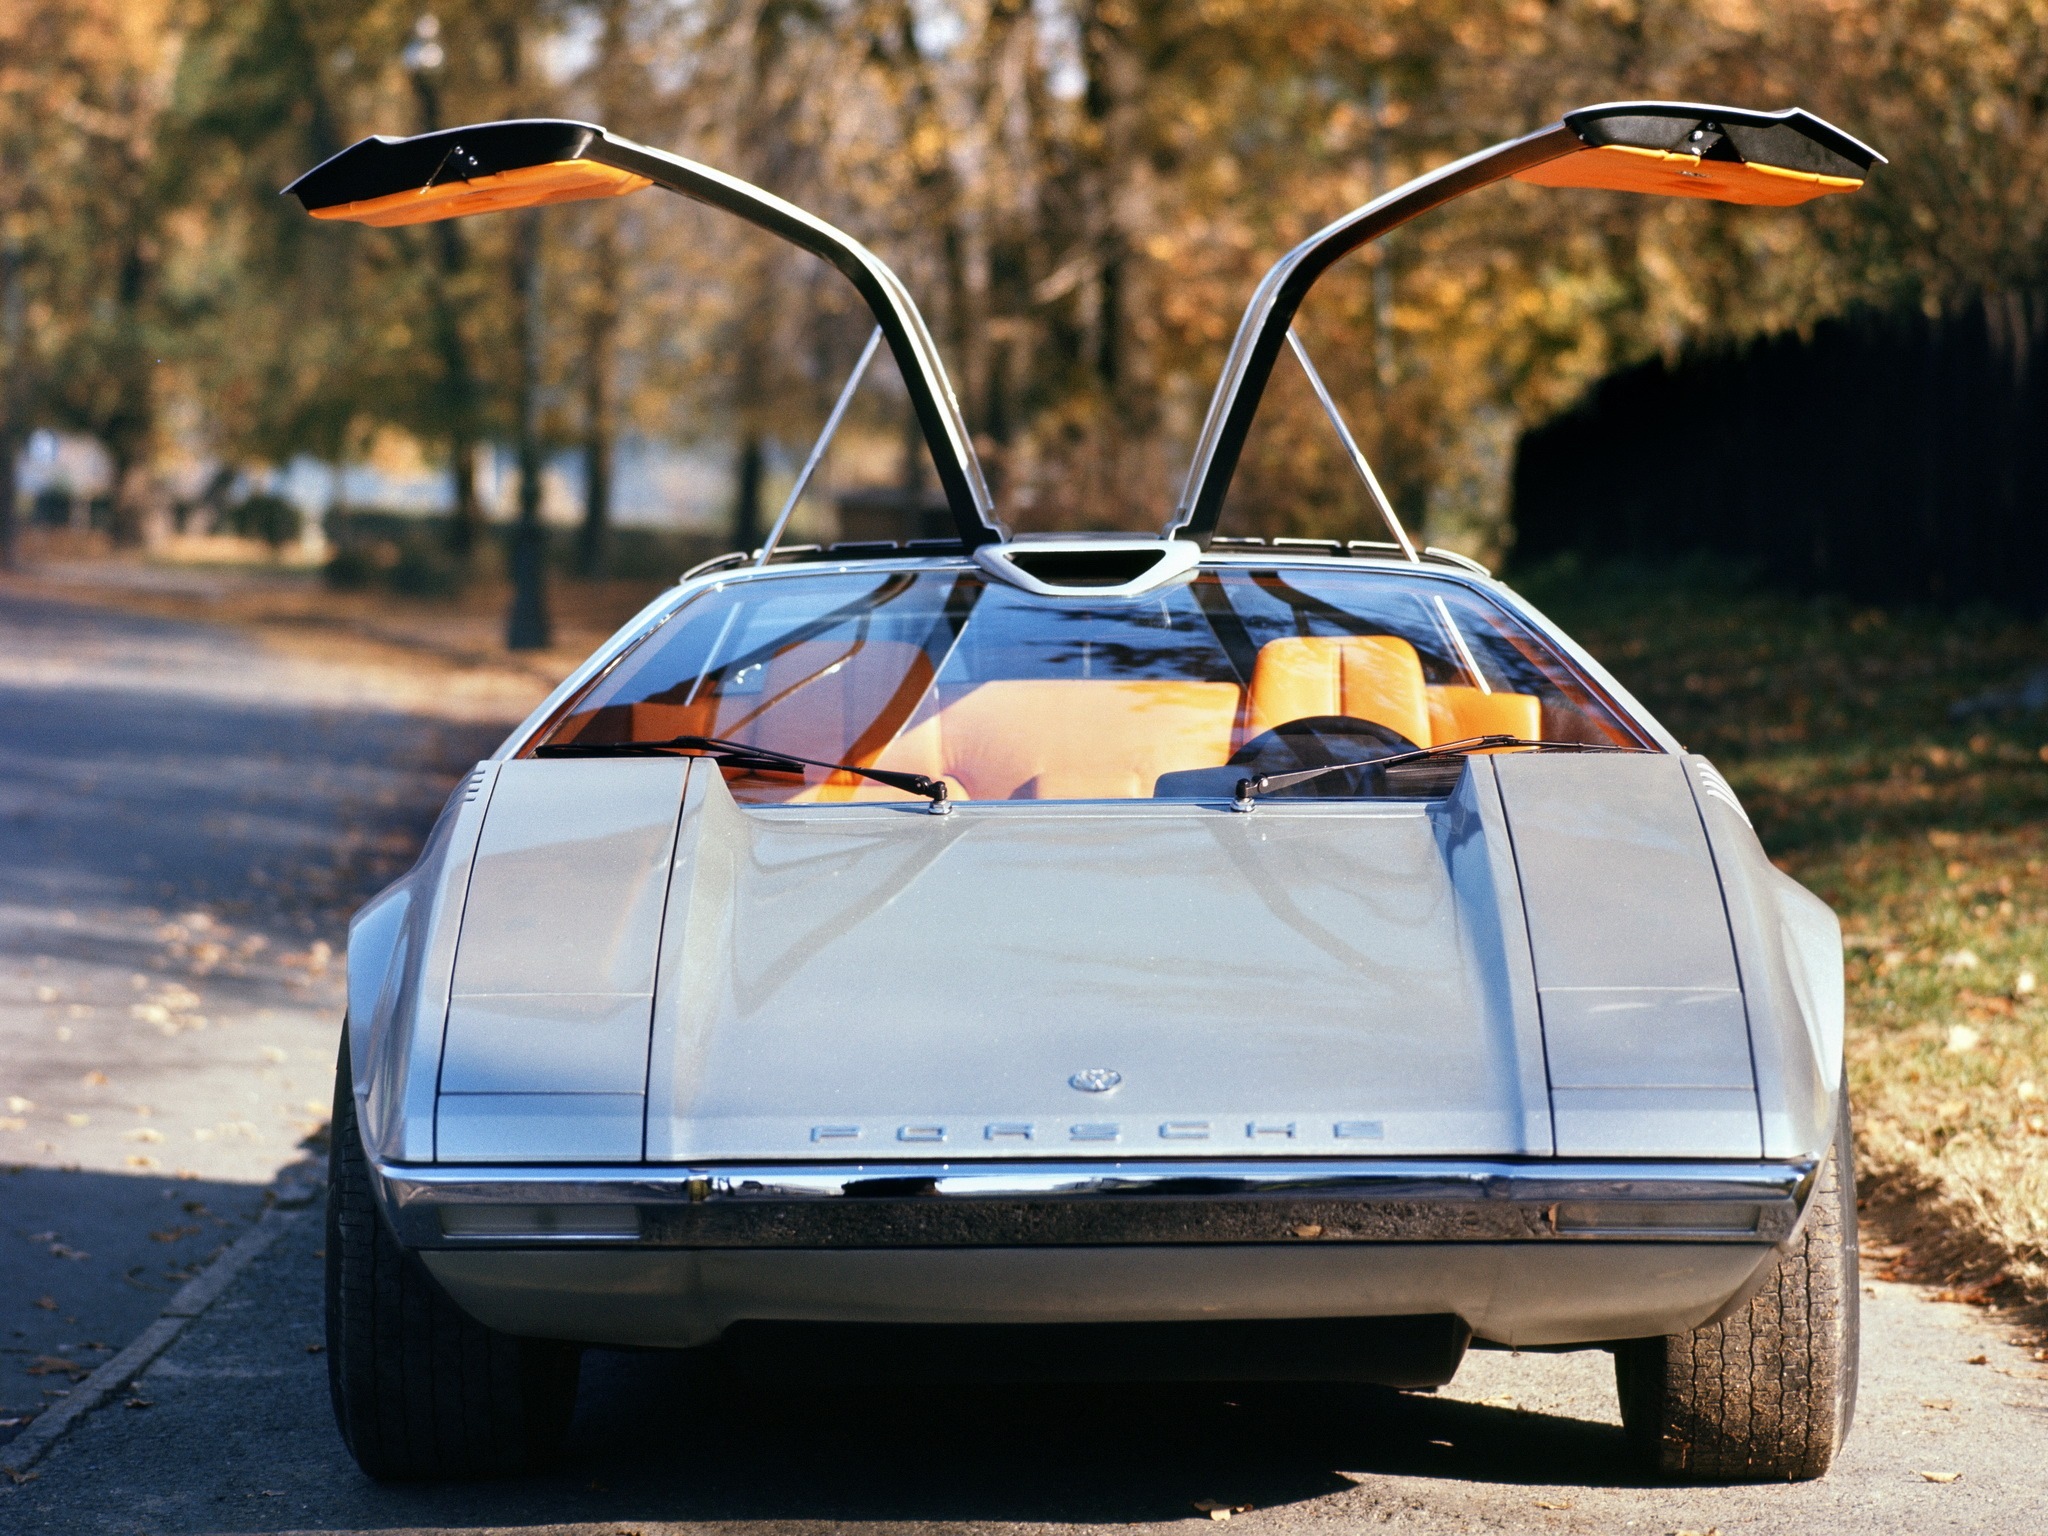 http://oldconceptcars.com/wp-content/uploads/volkswagen-porsche_tapiro_9.jpg